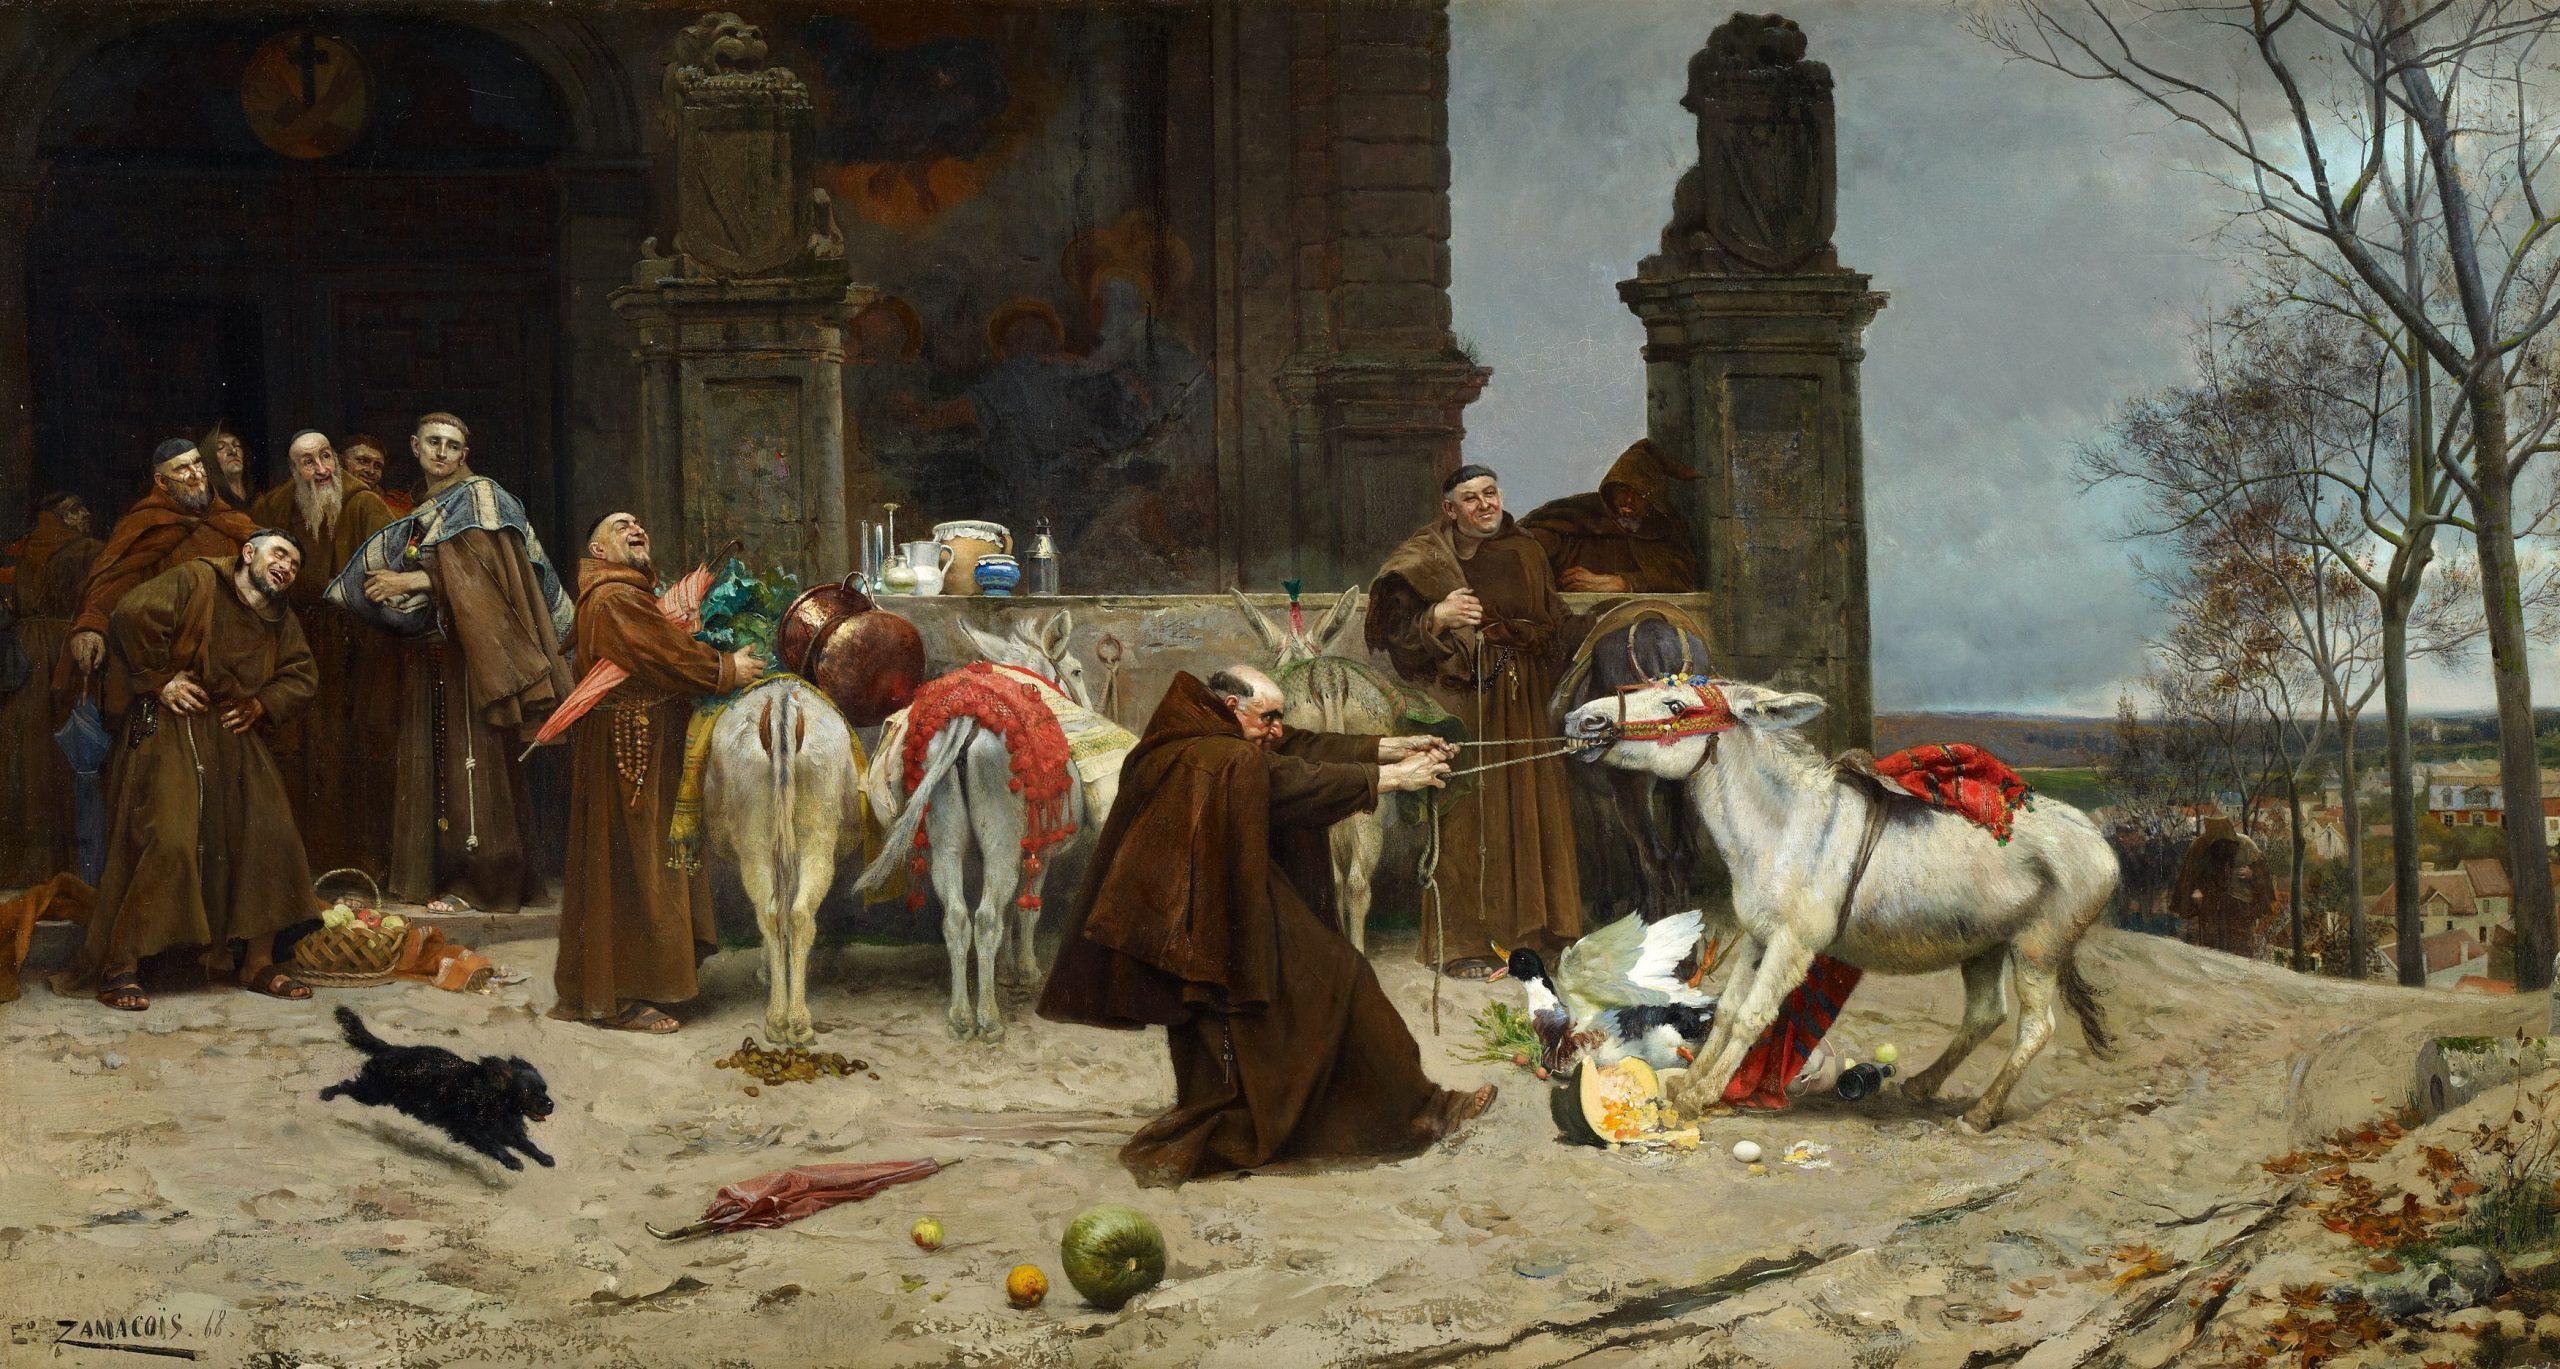 1868 Zamacois Eduardo, Regresso al Convent, Fondation CarmenThyssen, Malaga, CTB 199726